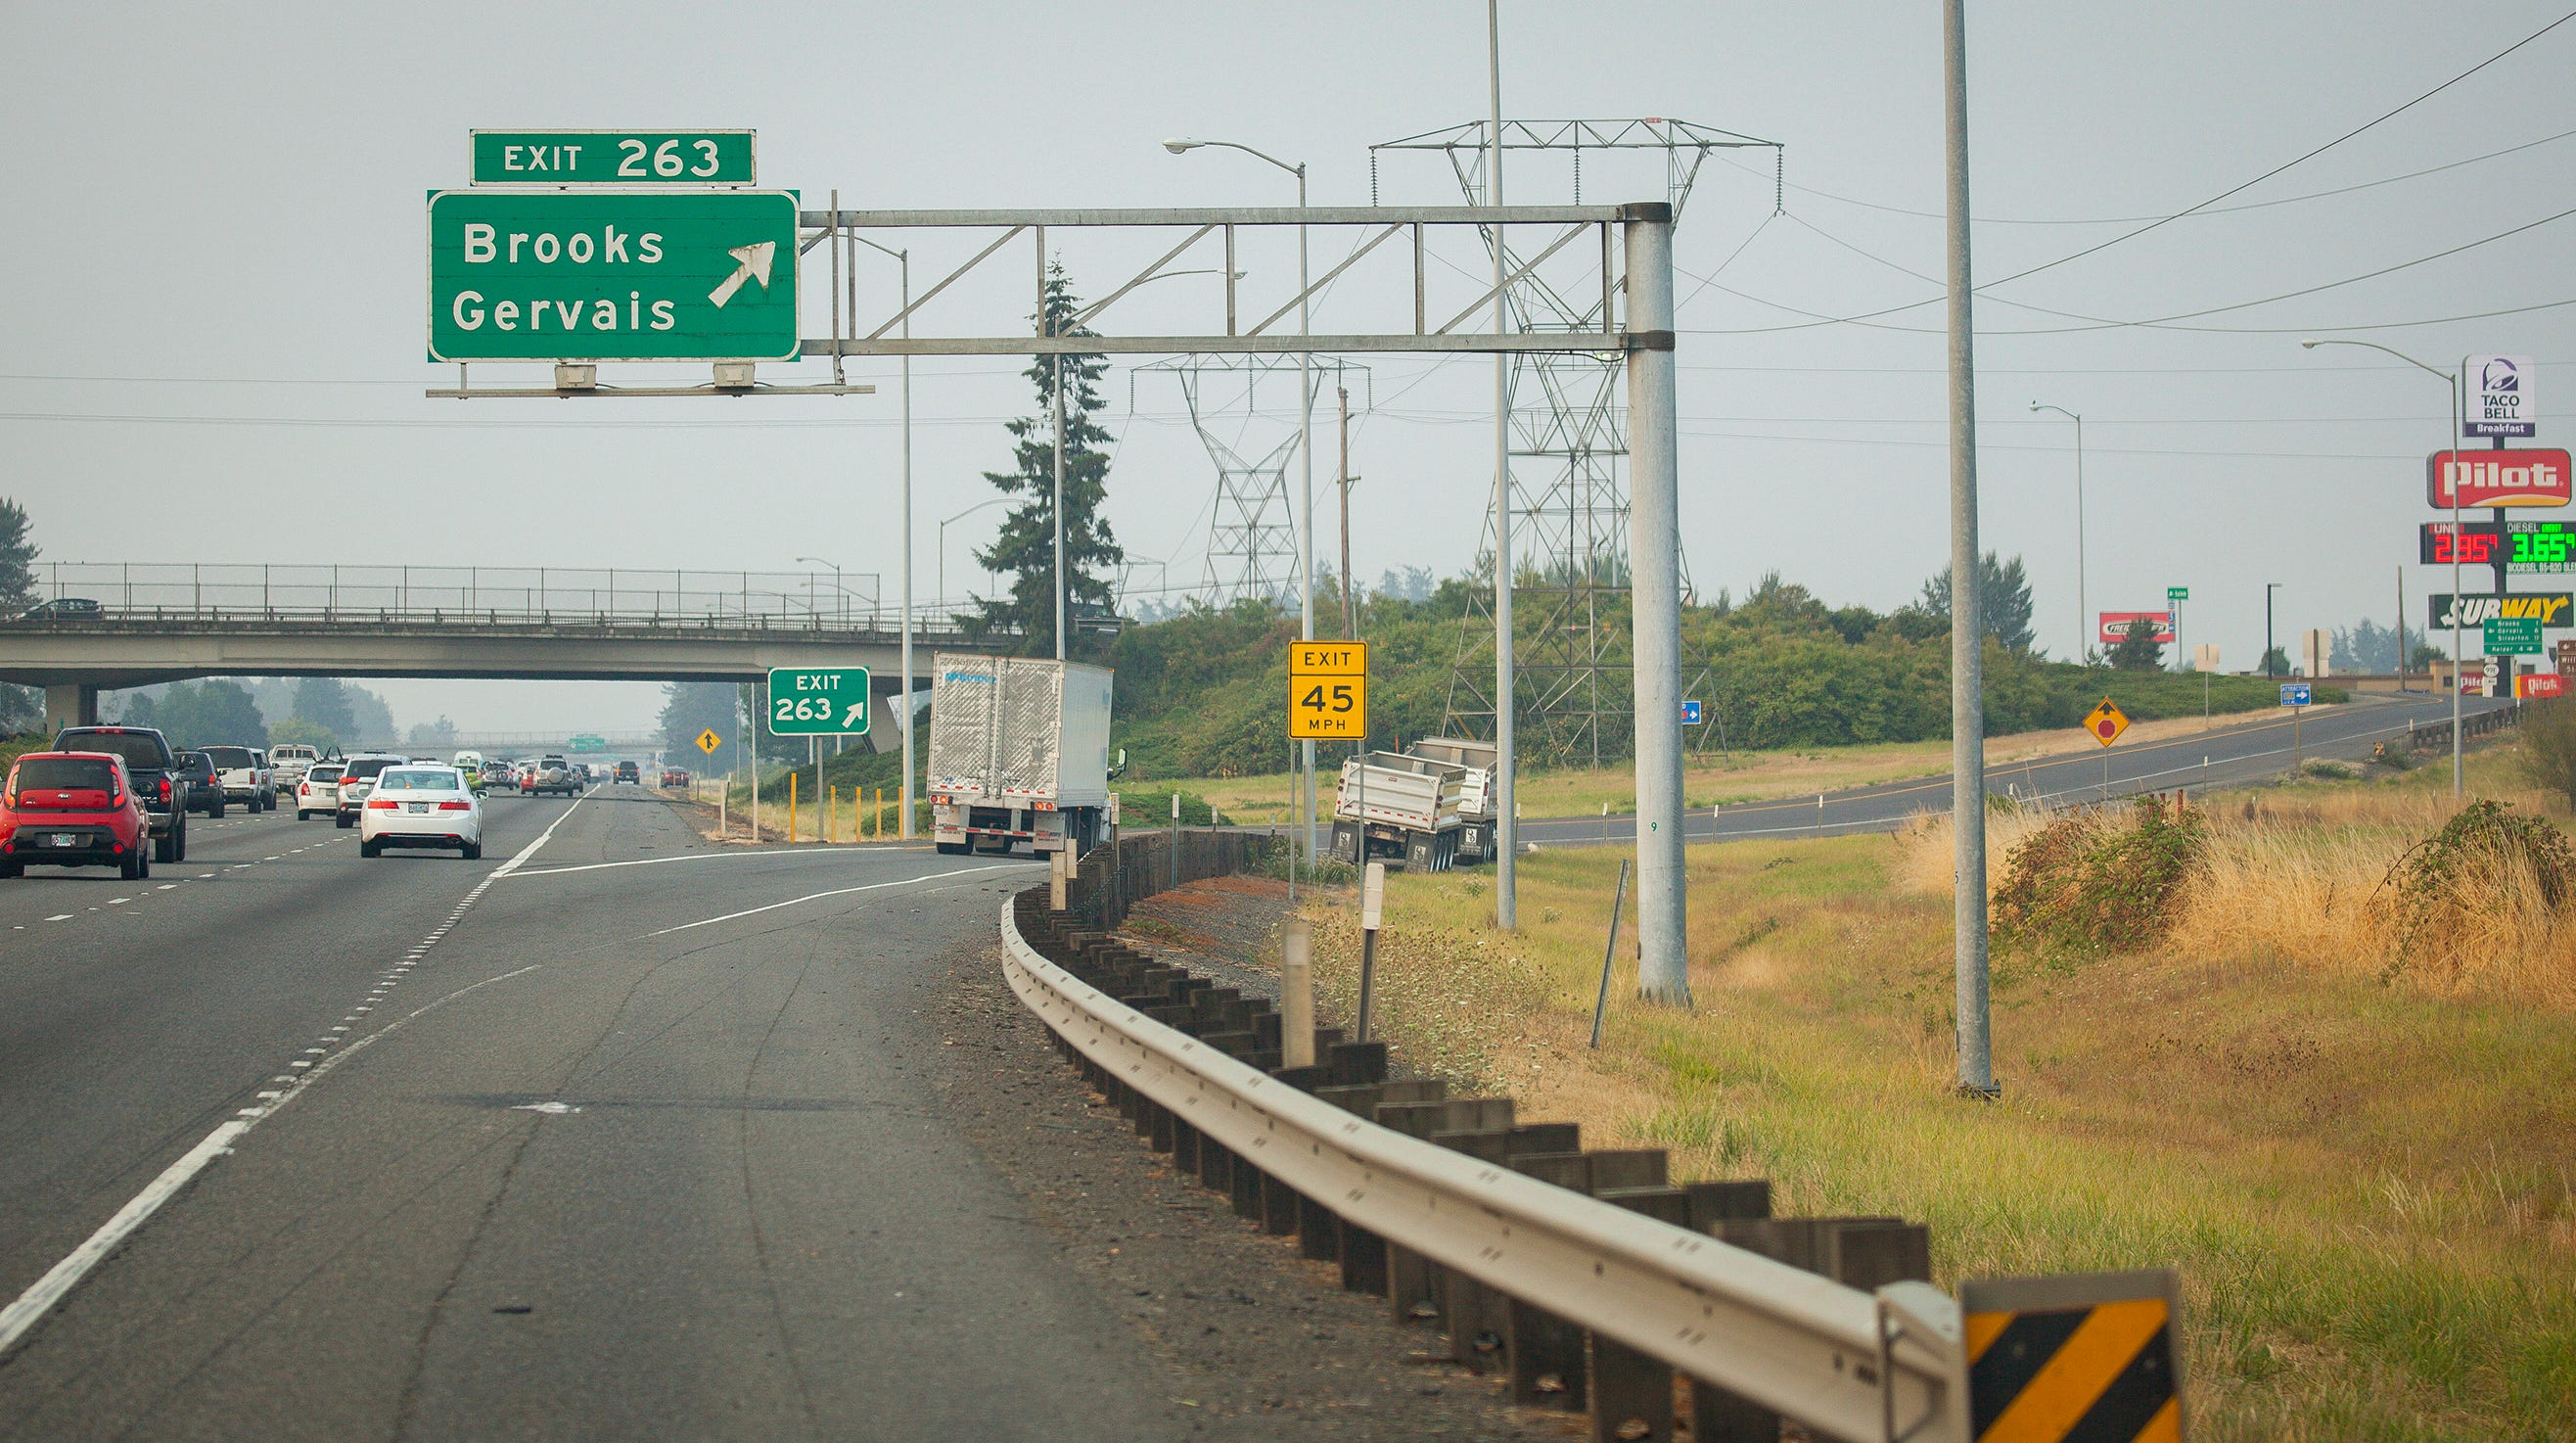 Brooks intermodal facility could spur I-5 interchange improvements